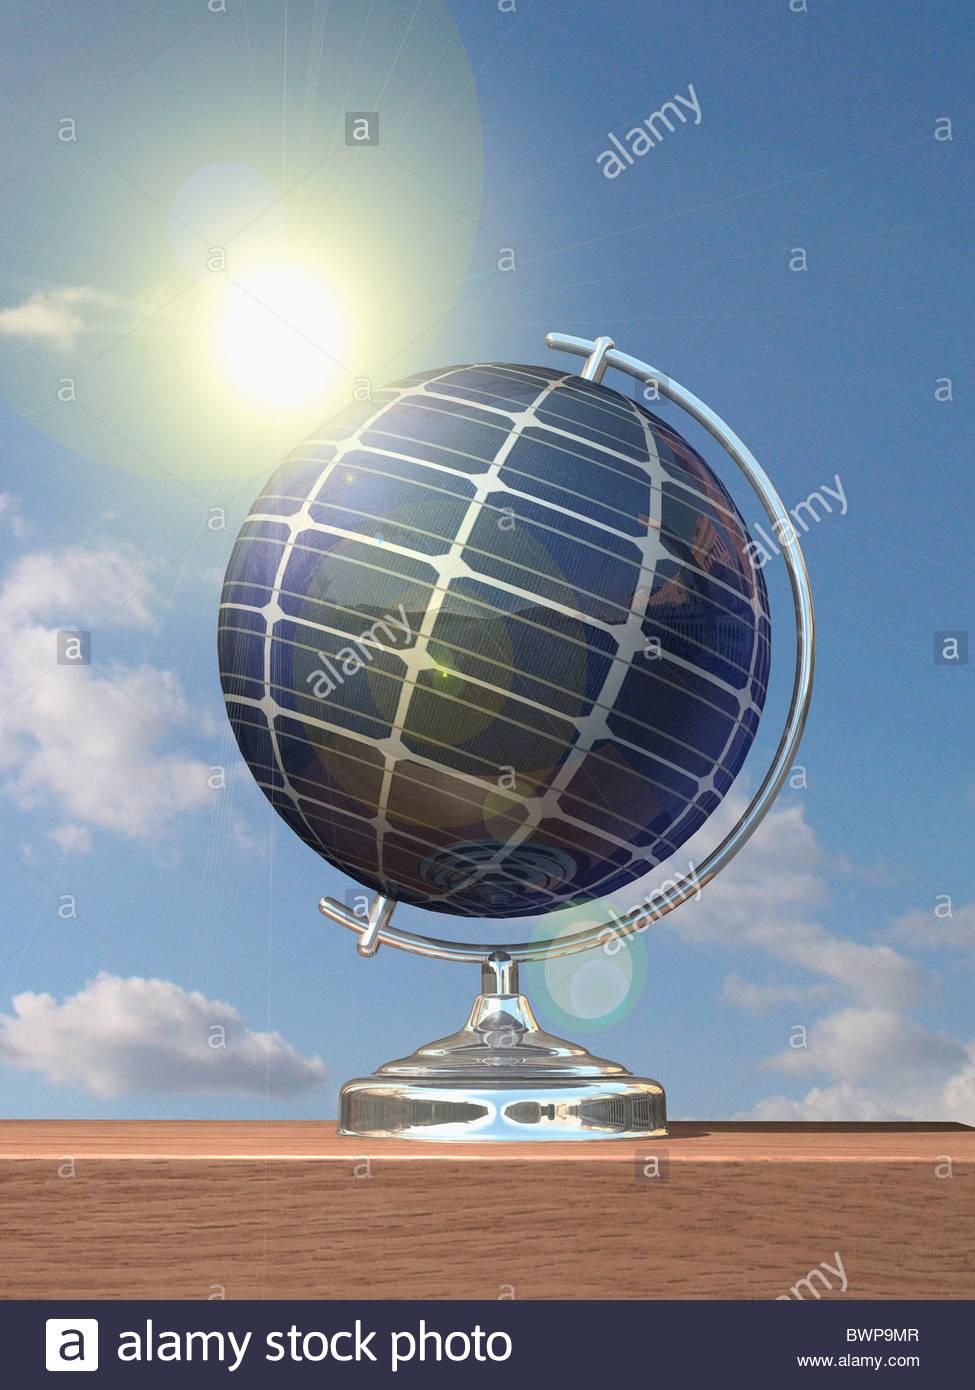 Sun shining on globe covered in solar panels - Stock Image